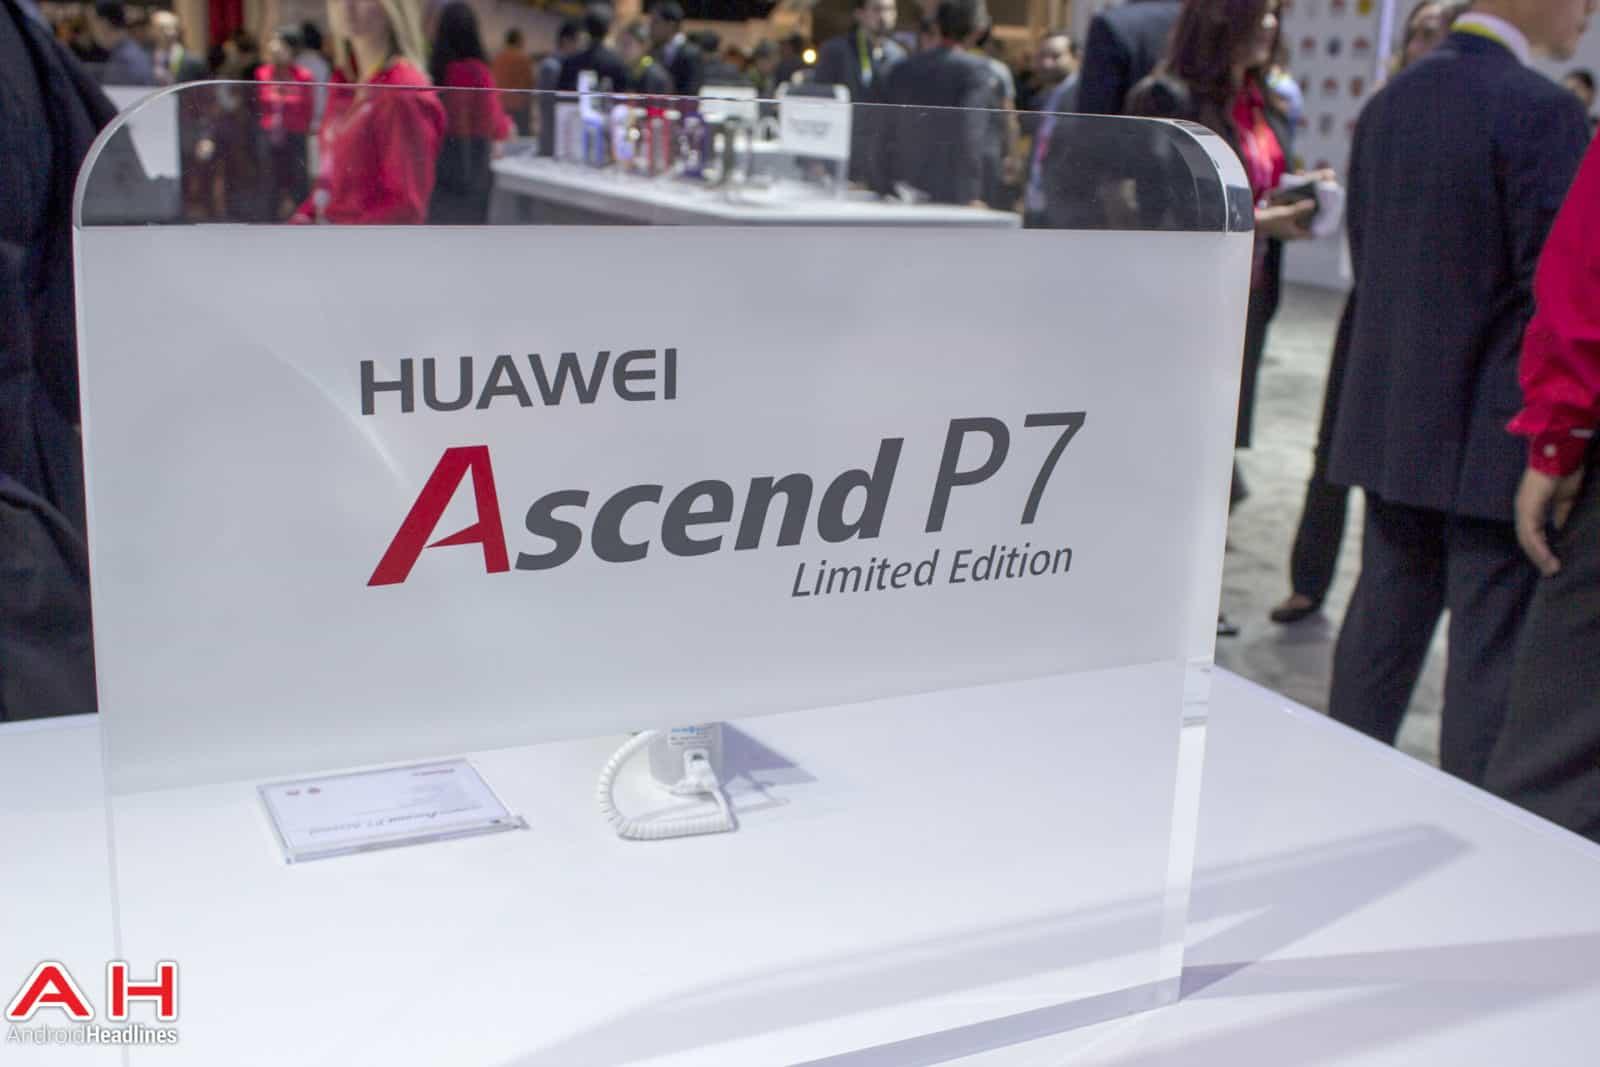 Huawei-Ascend-P7-AH-1